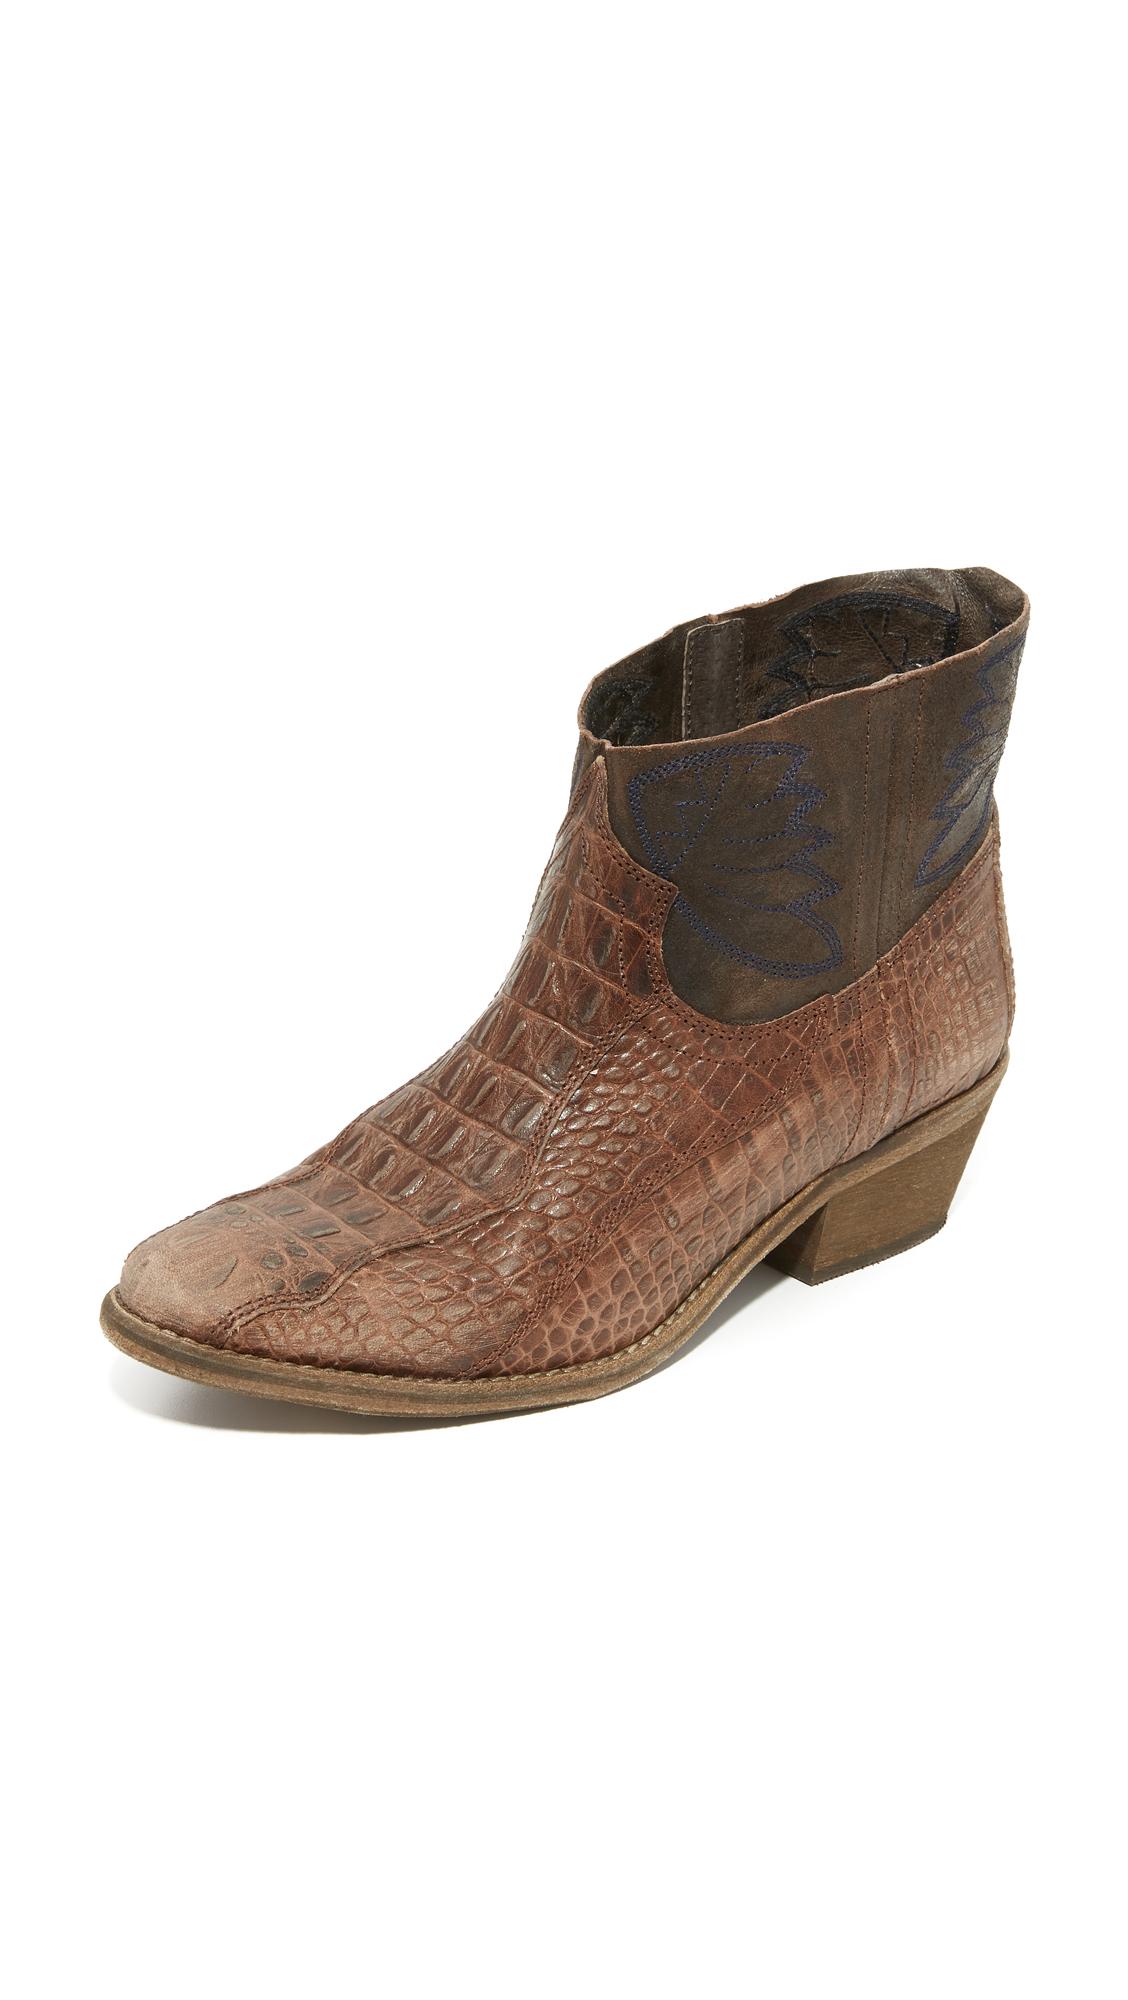 Free People Dorado Ankle Booties - Brown Combo